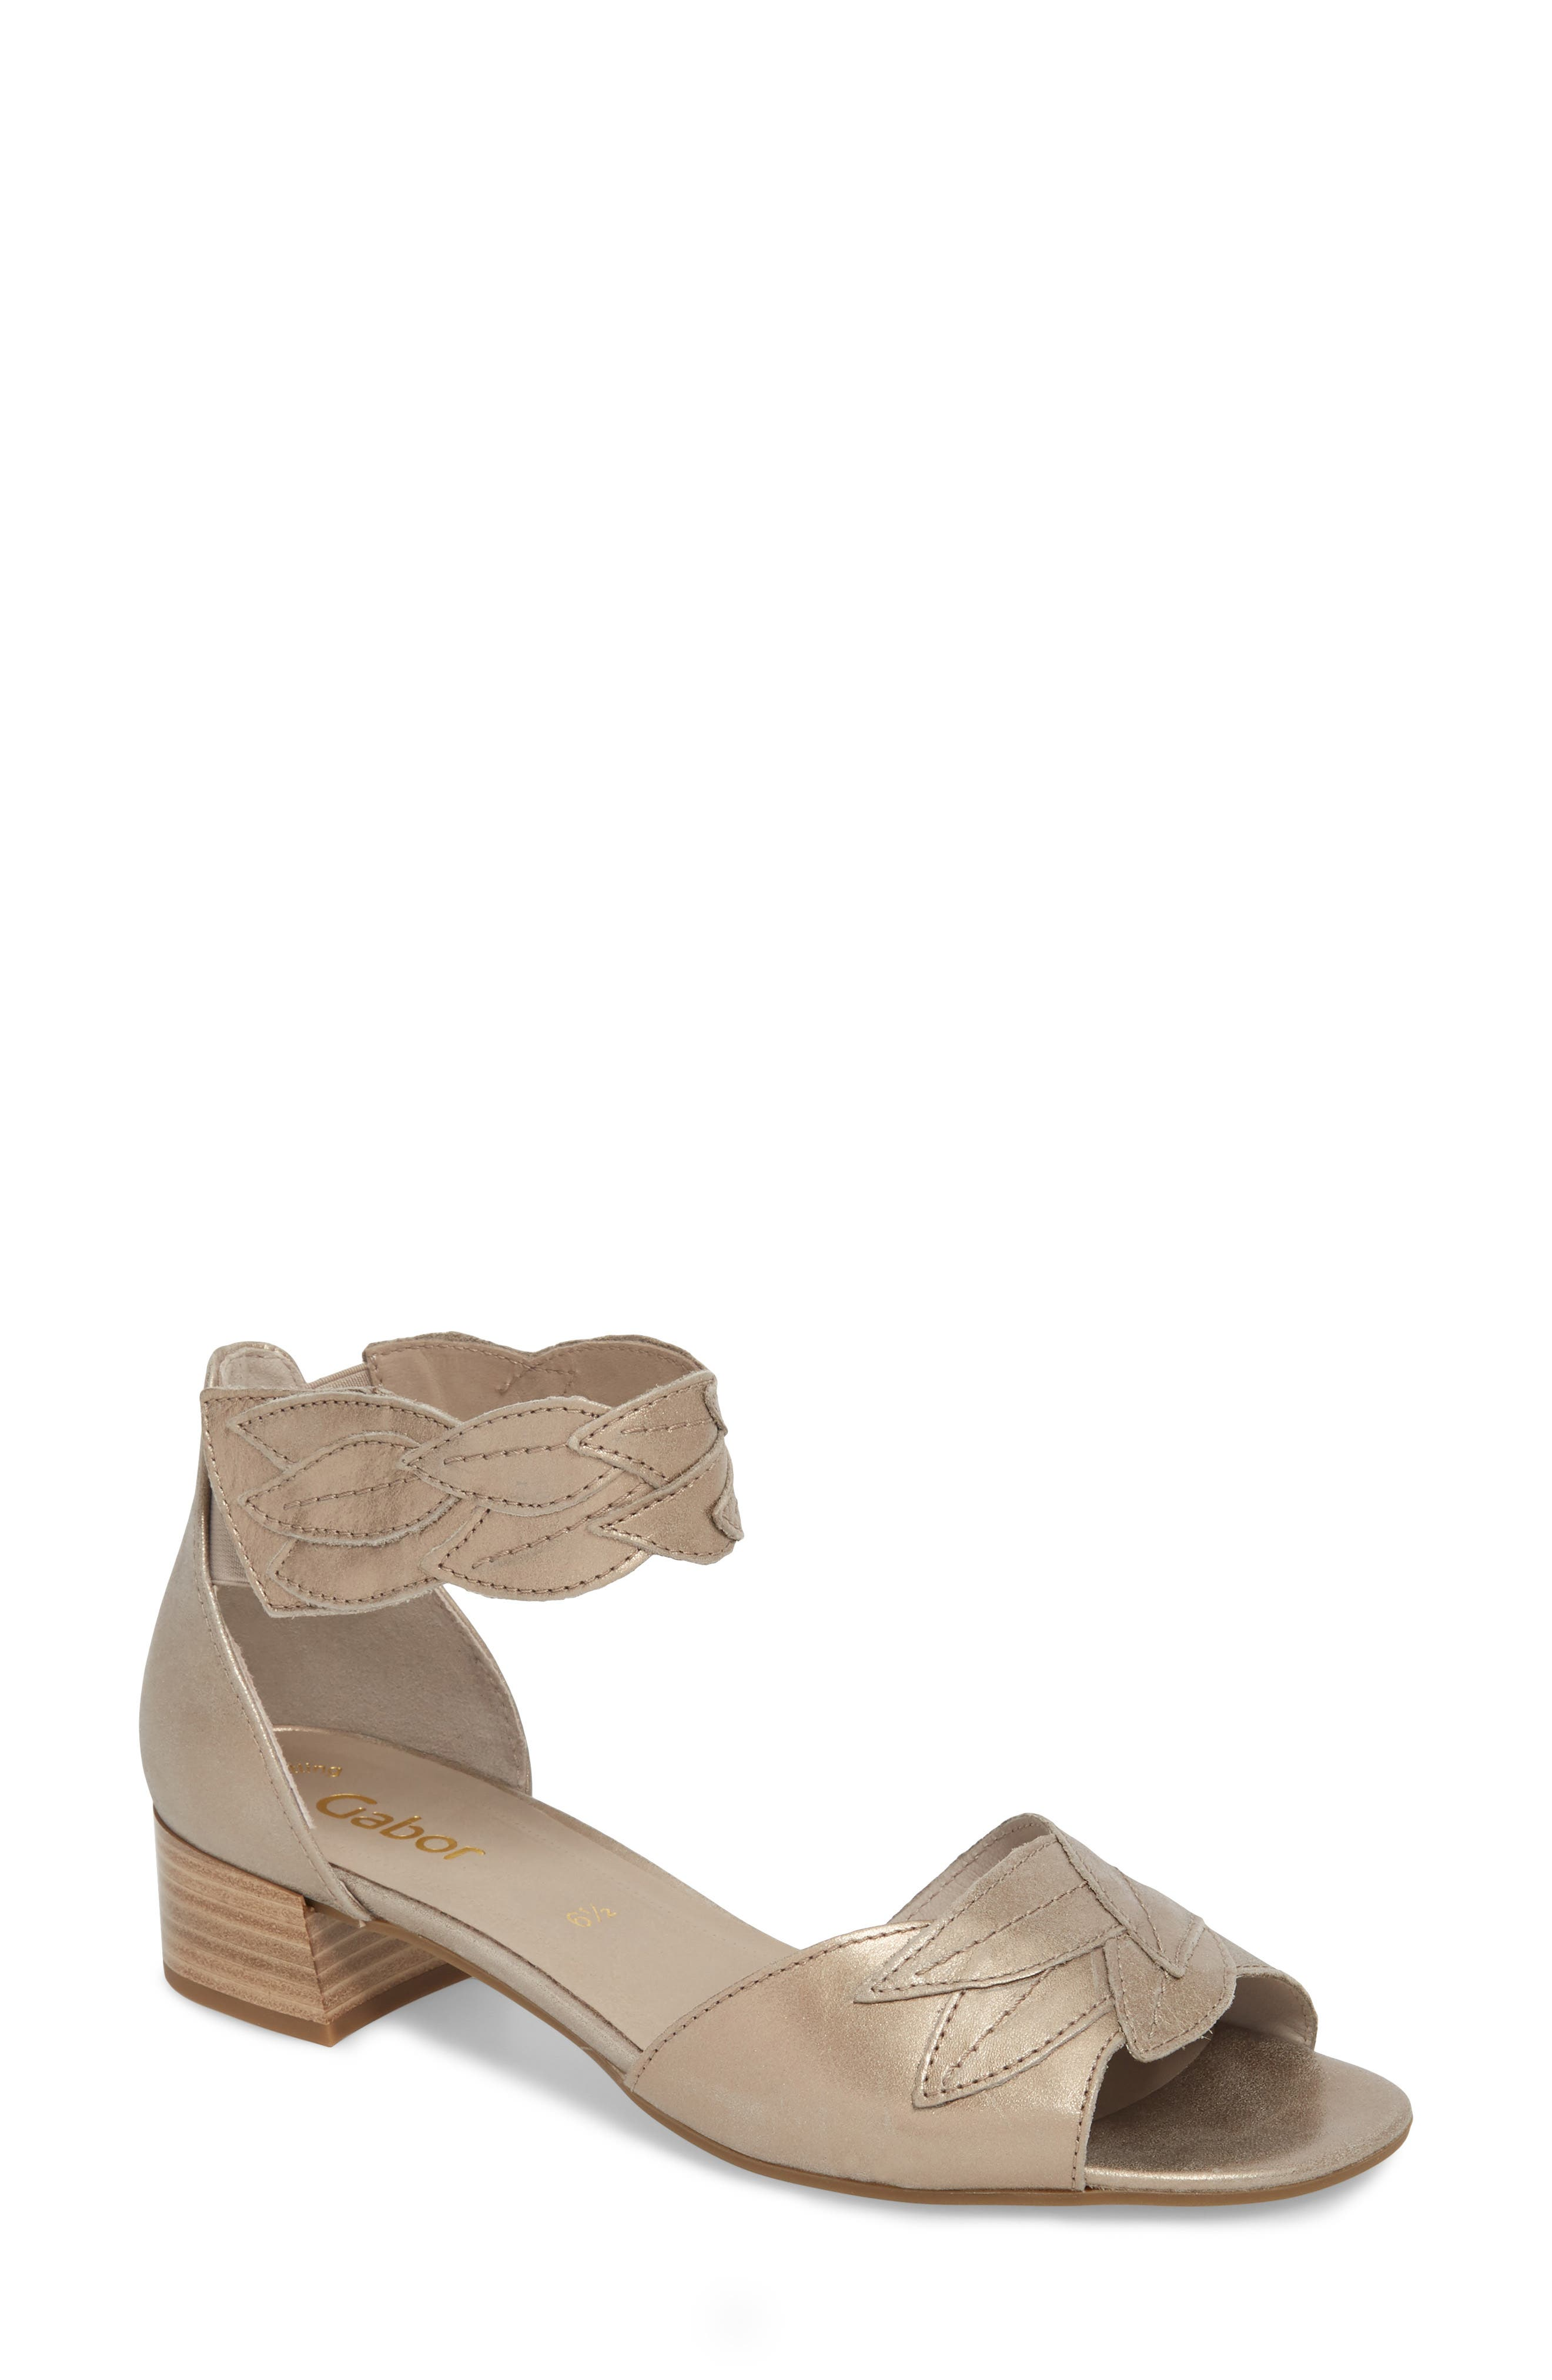 Leaf Ankle Strap Sandal,                             Main thumbnail 1, color,                             Beige Metallic Leather